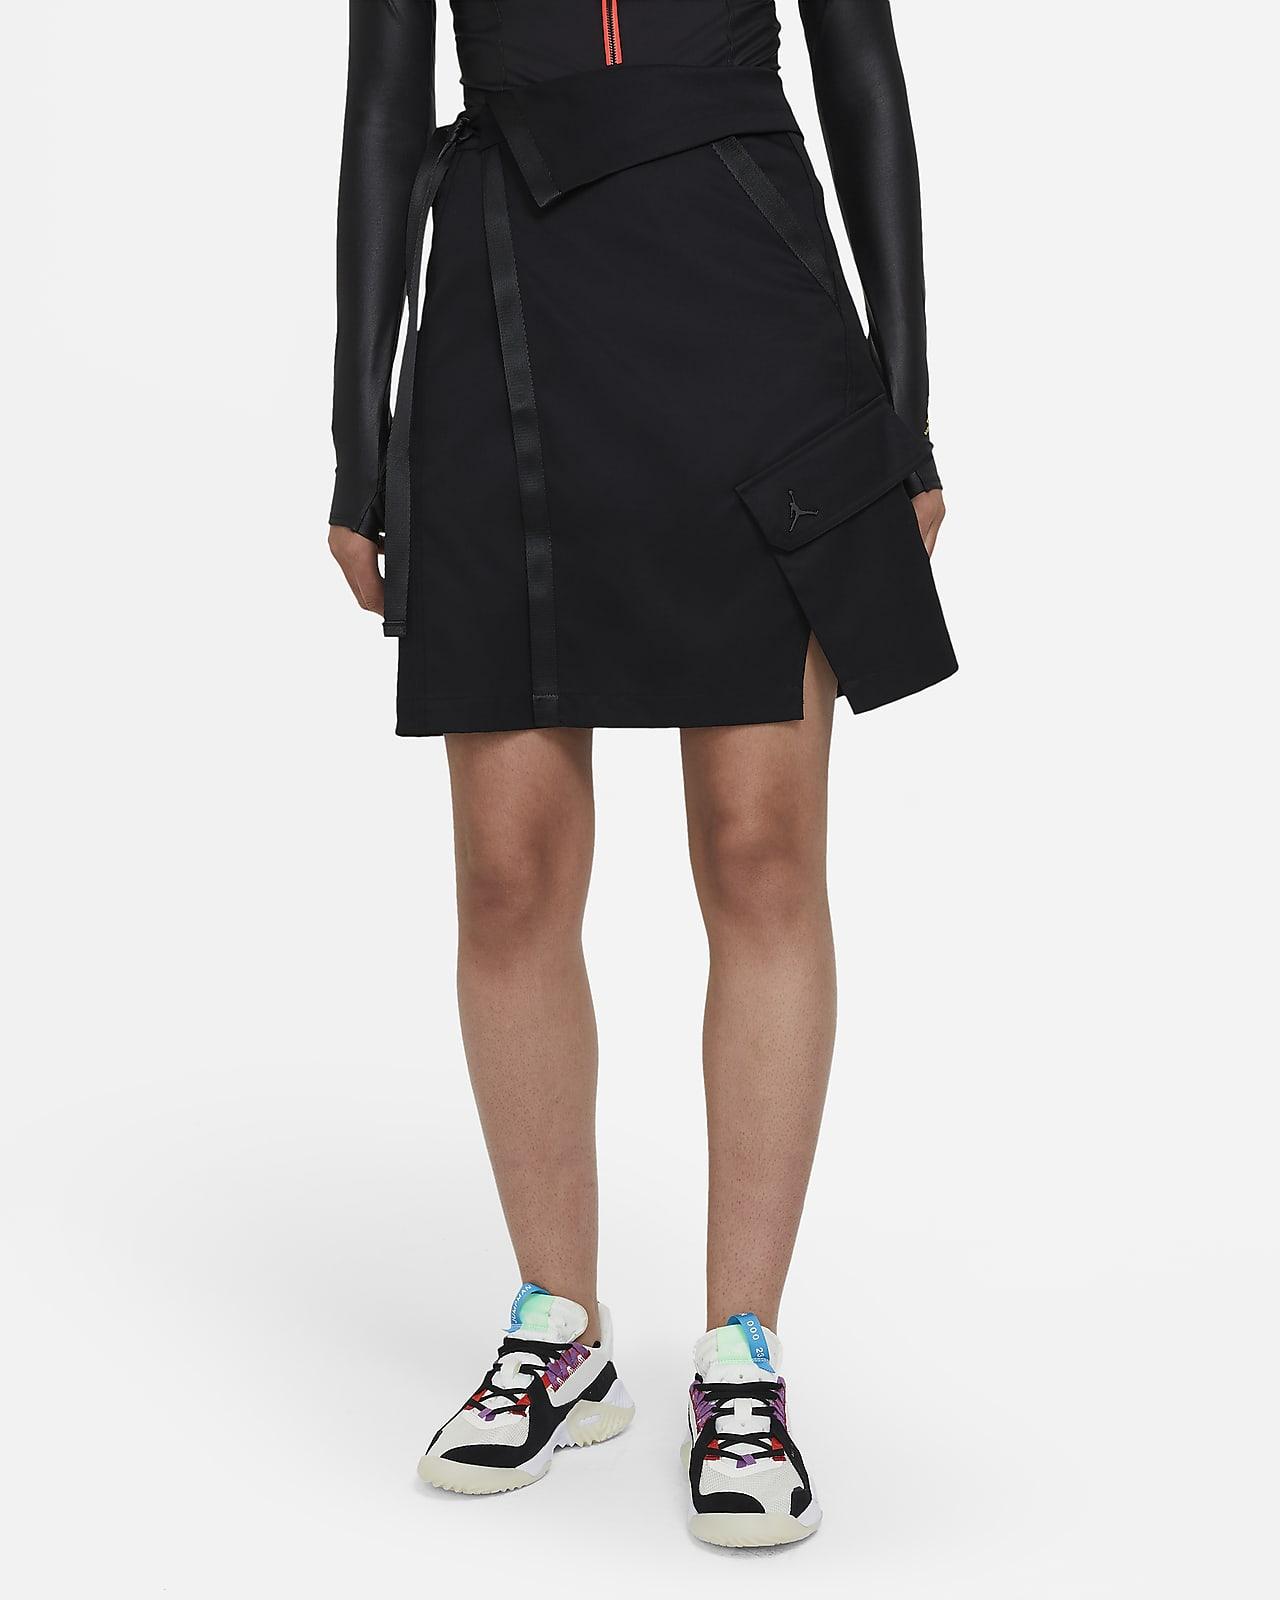 Jordan Future Primal 女款多功能短裙